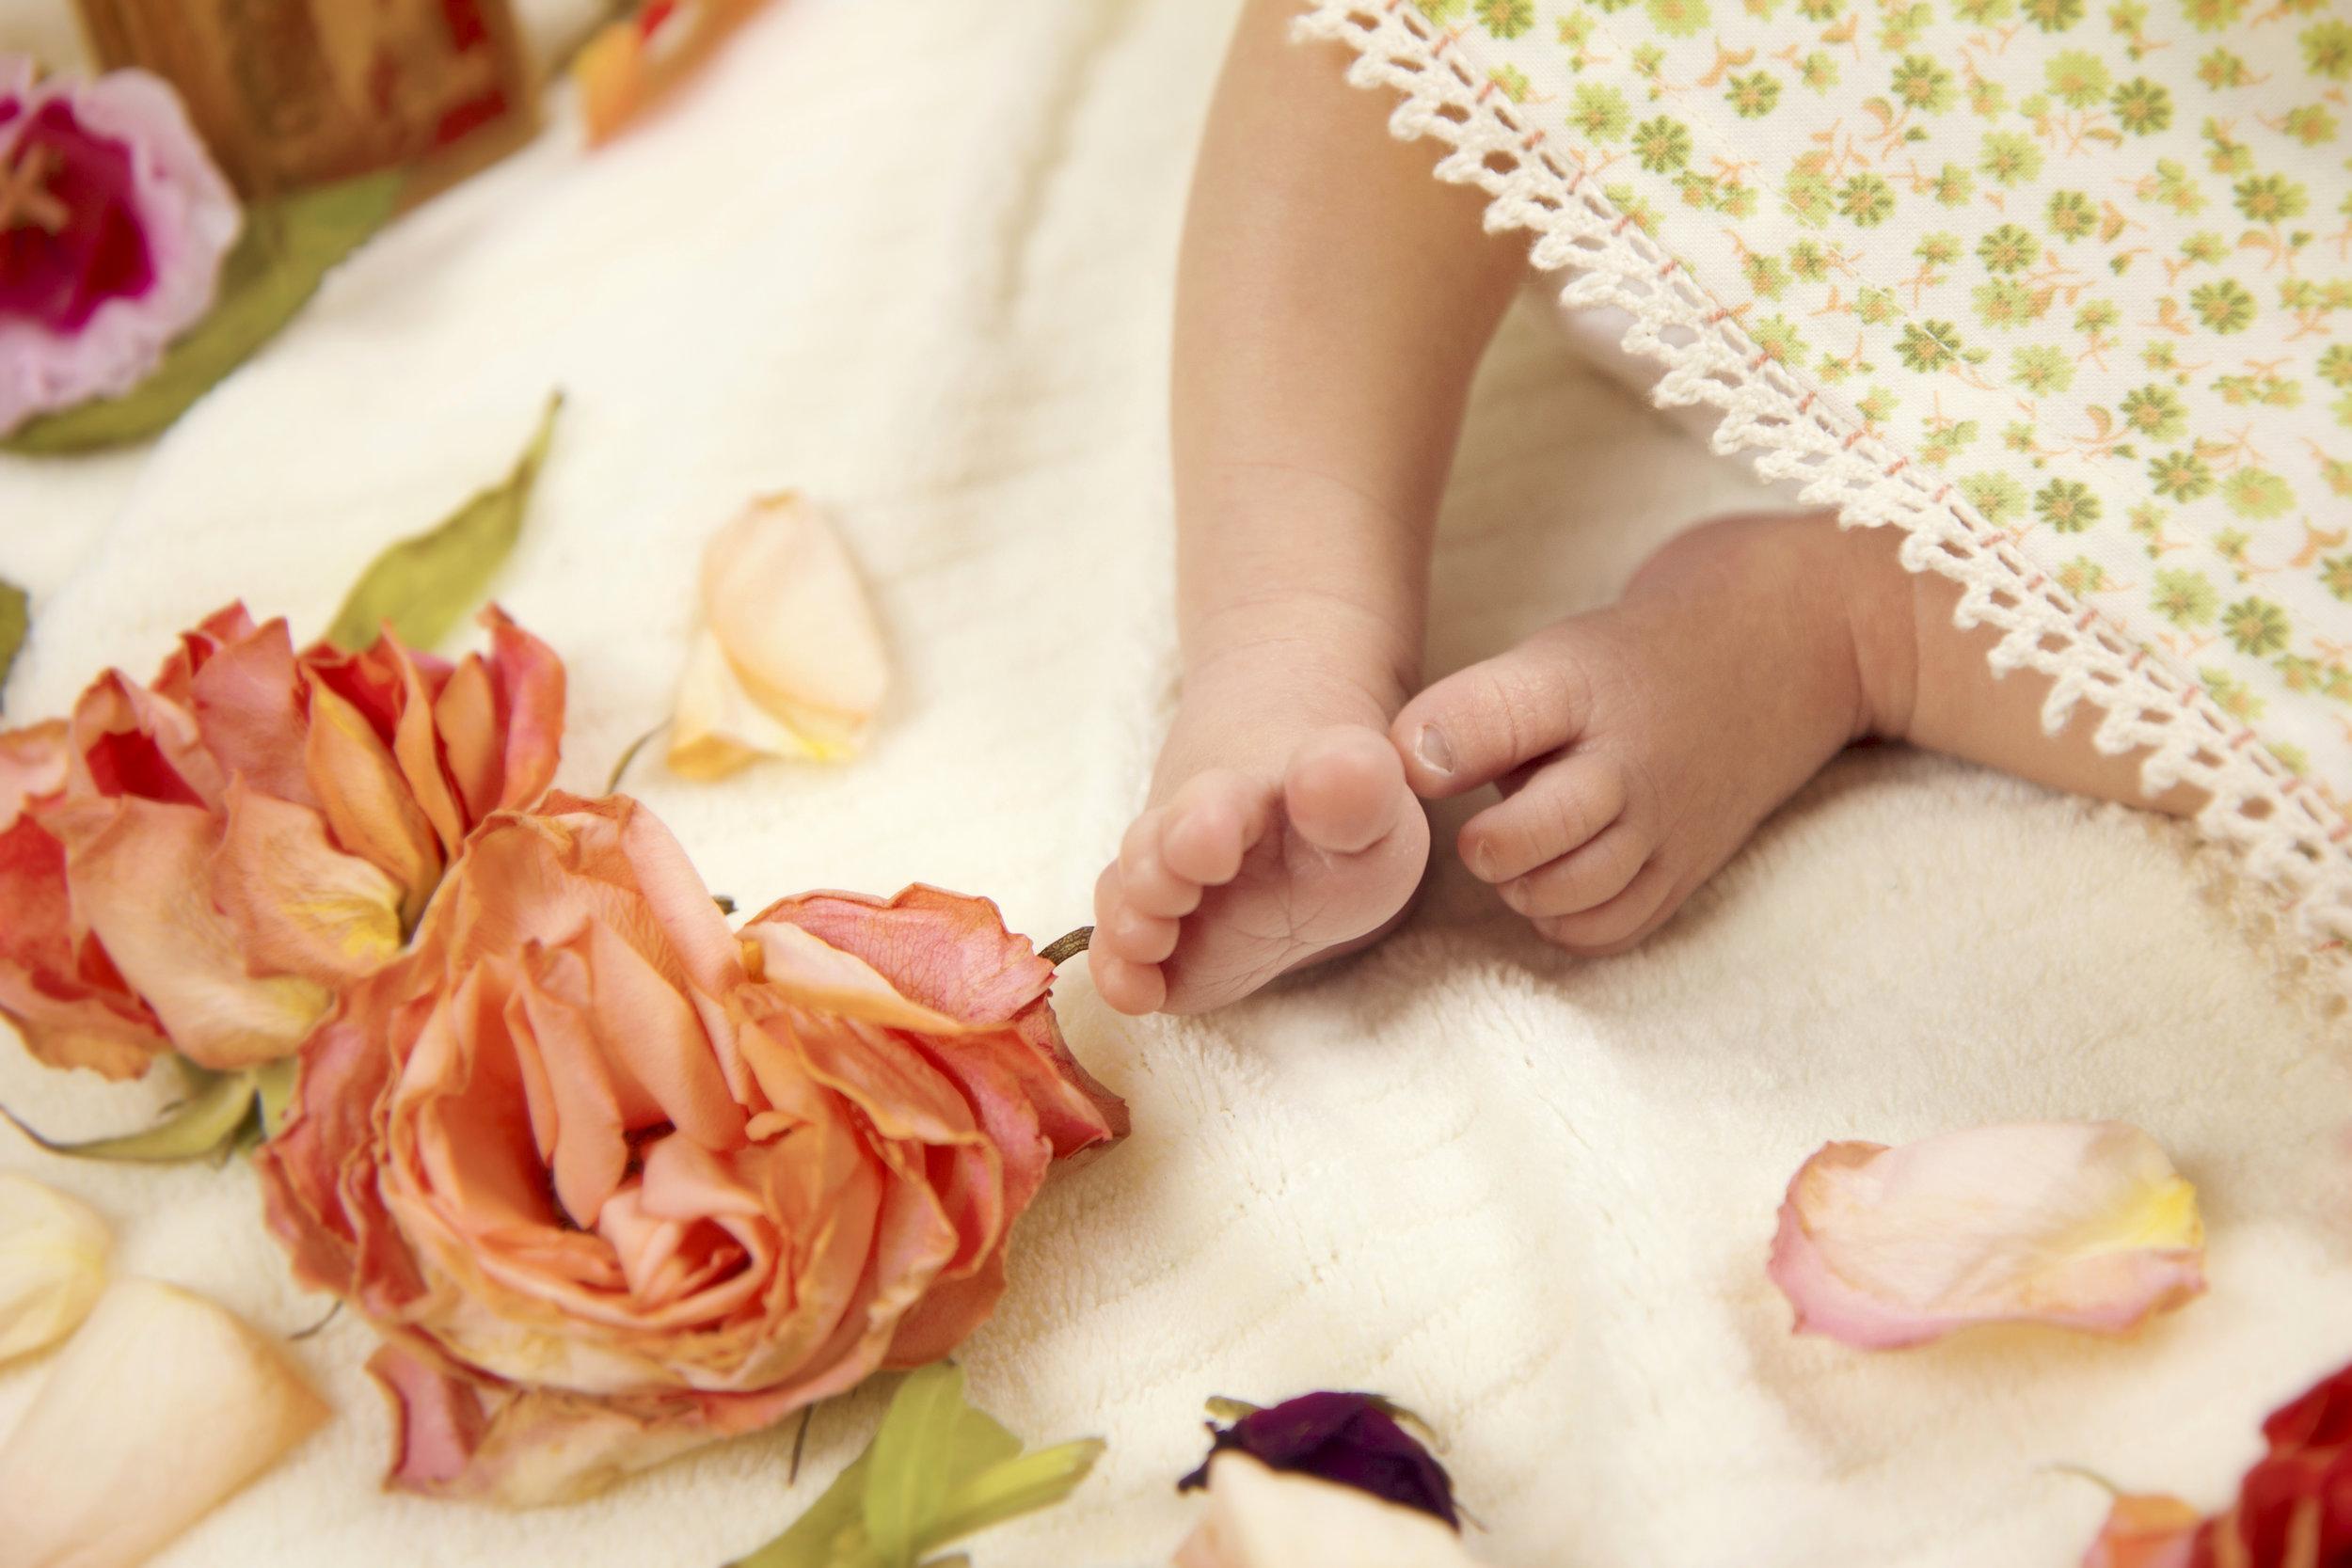 Baby_Lyla feet